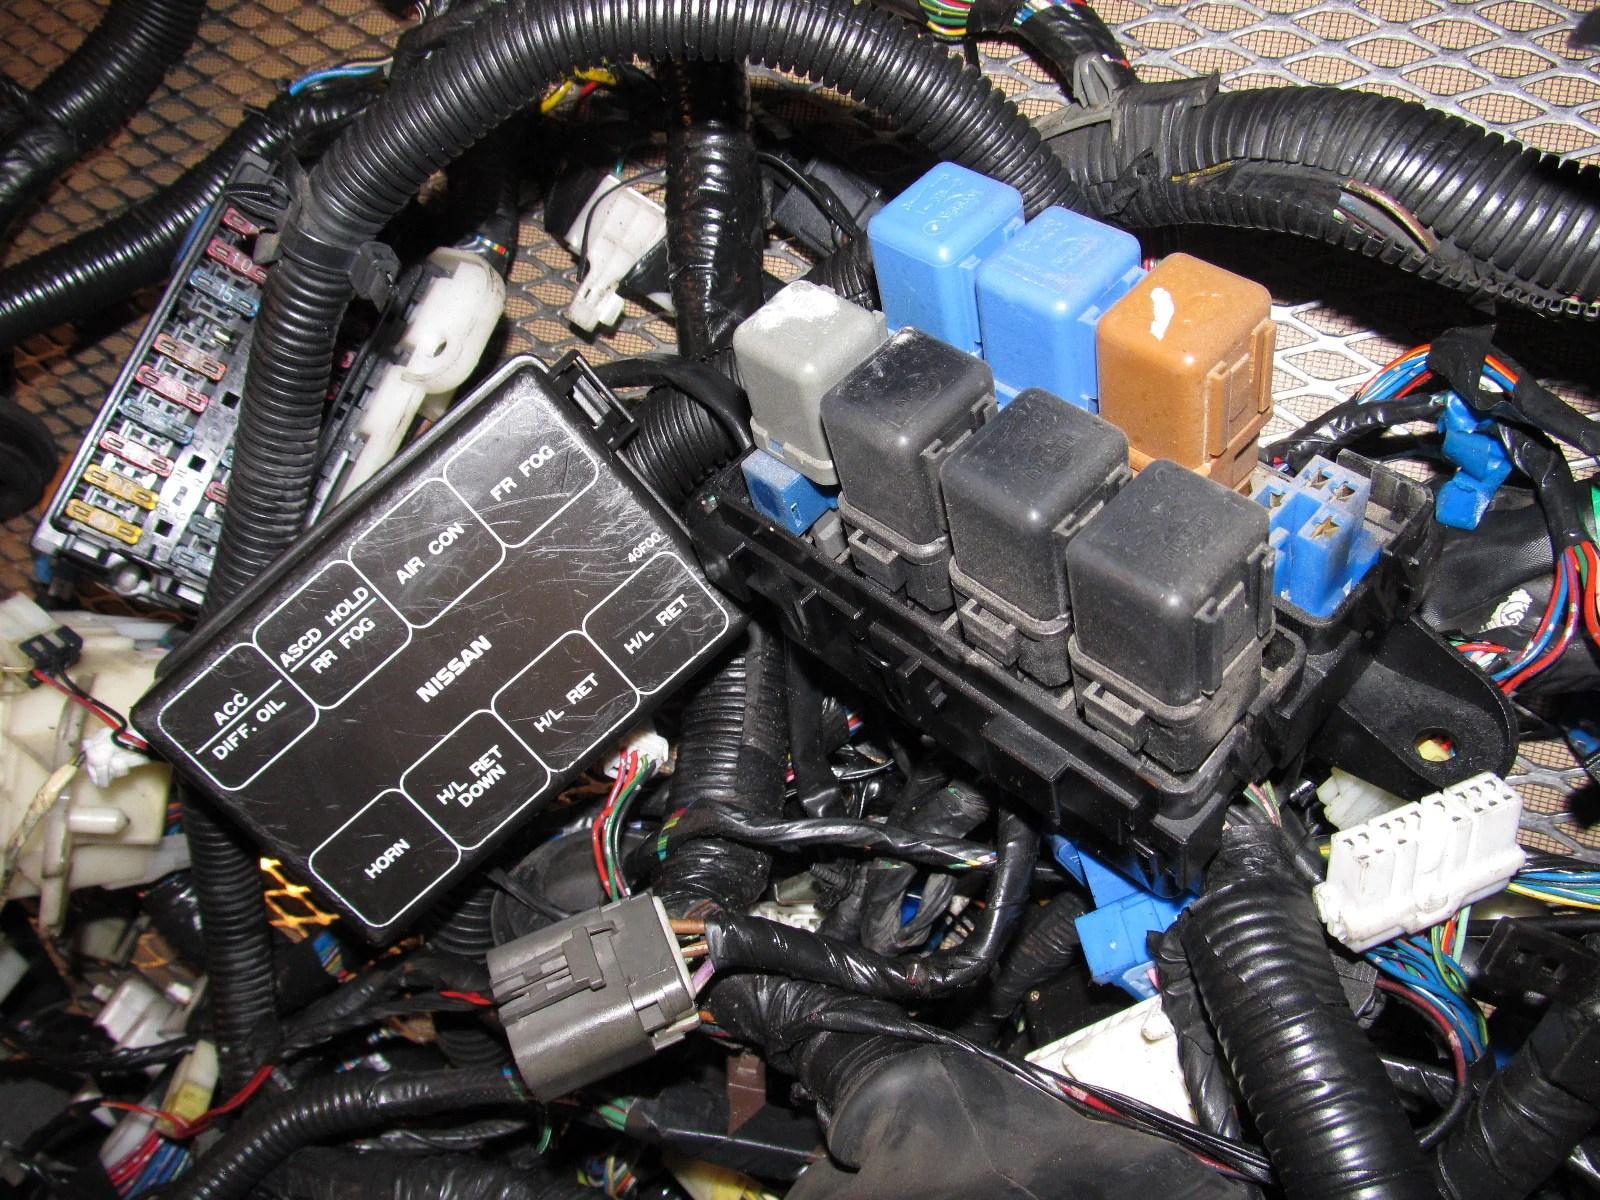 s14 fuse box on side of plugs  s14 fuse box on side of plugs #23